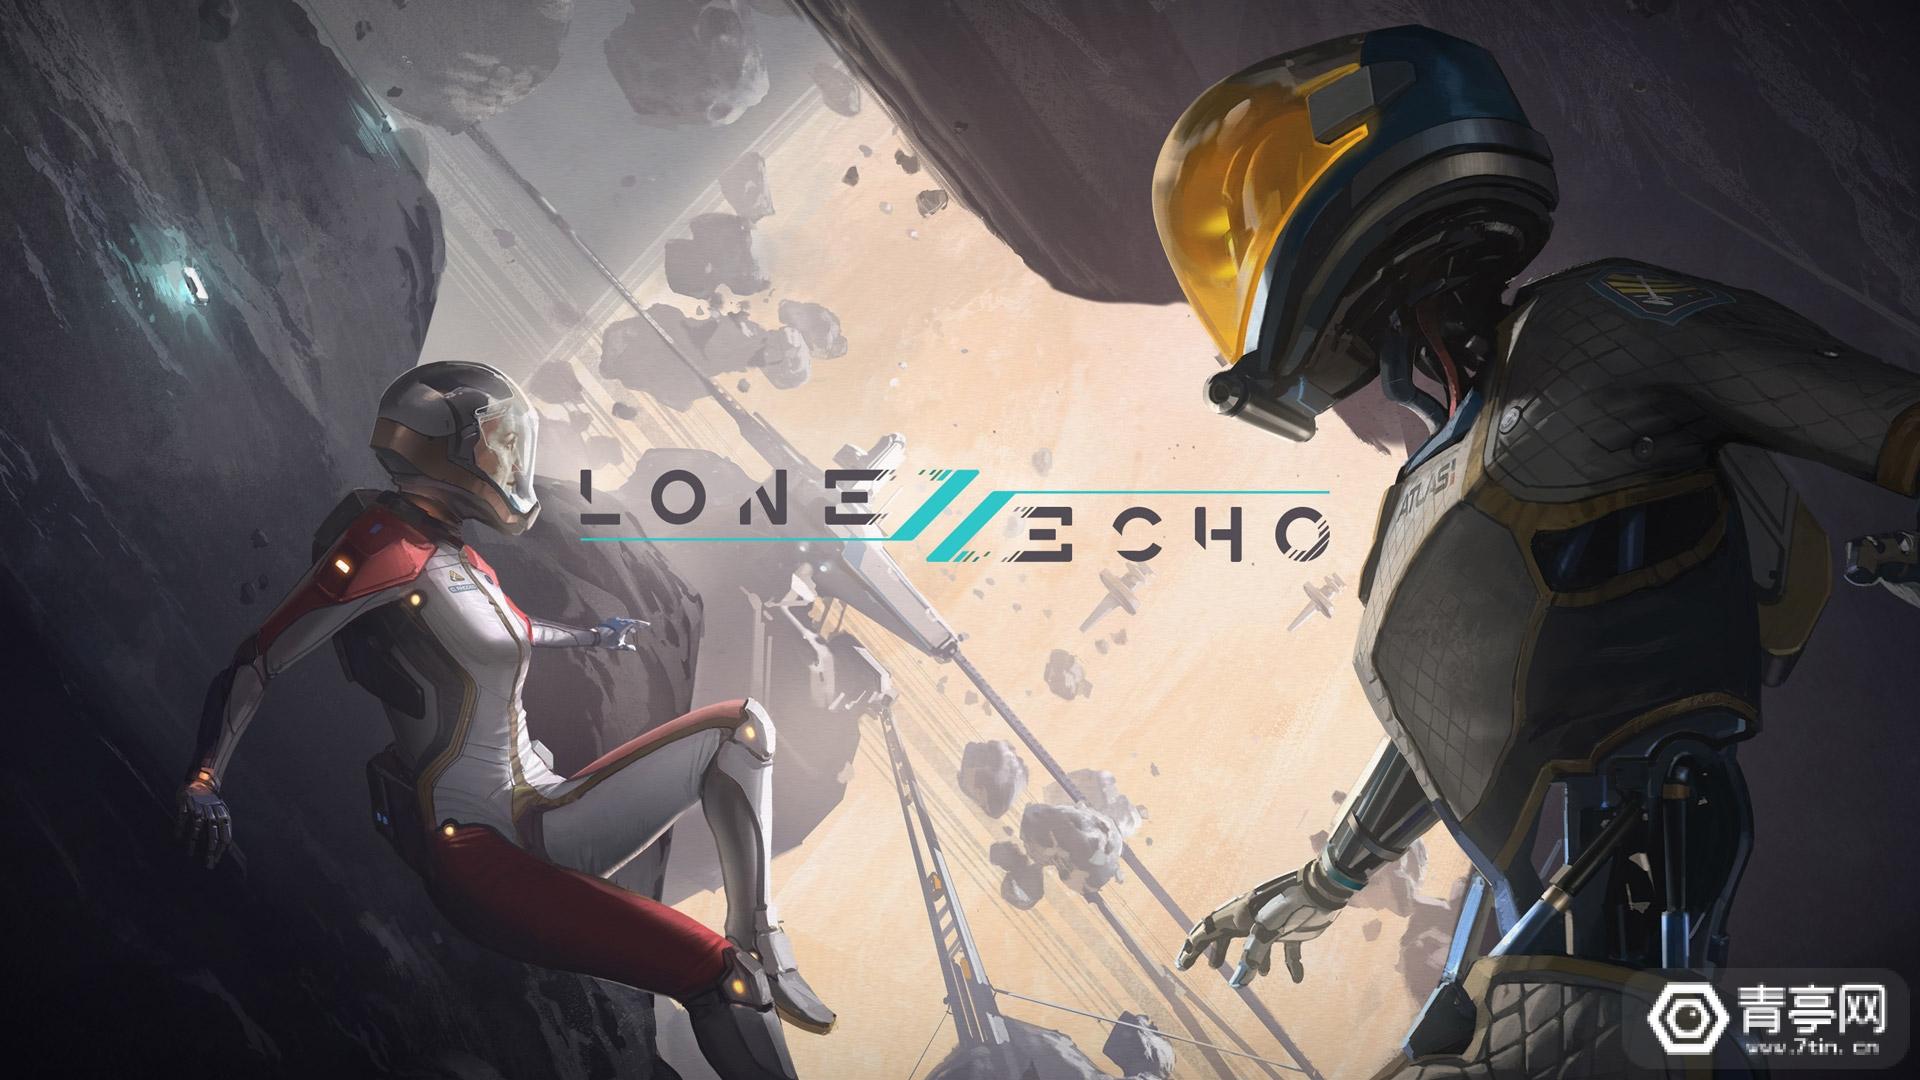 《Lone Echo II》8月24日上线,仅支持Rift平台